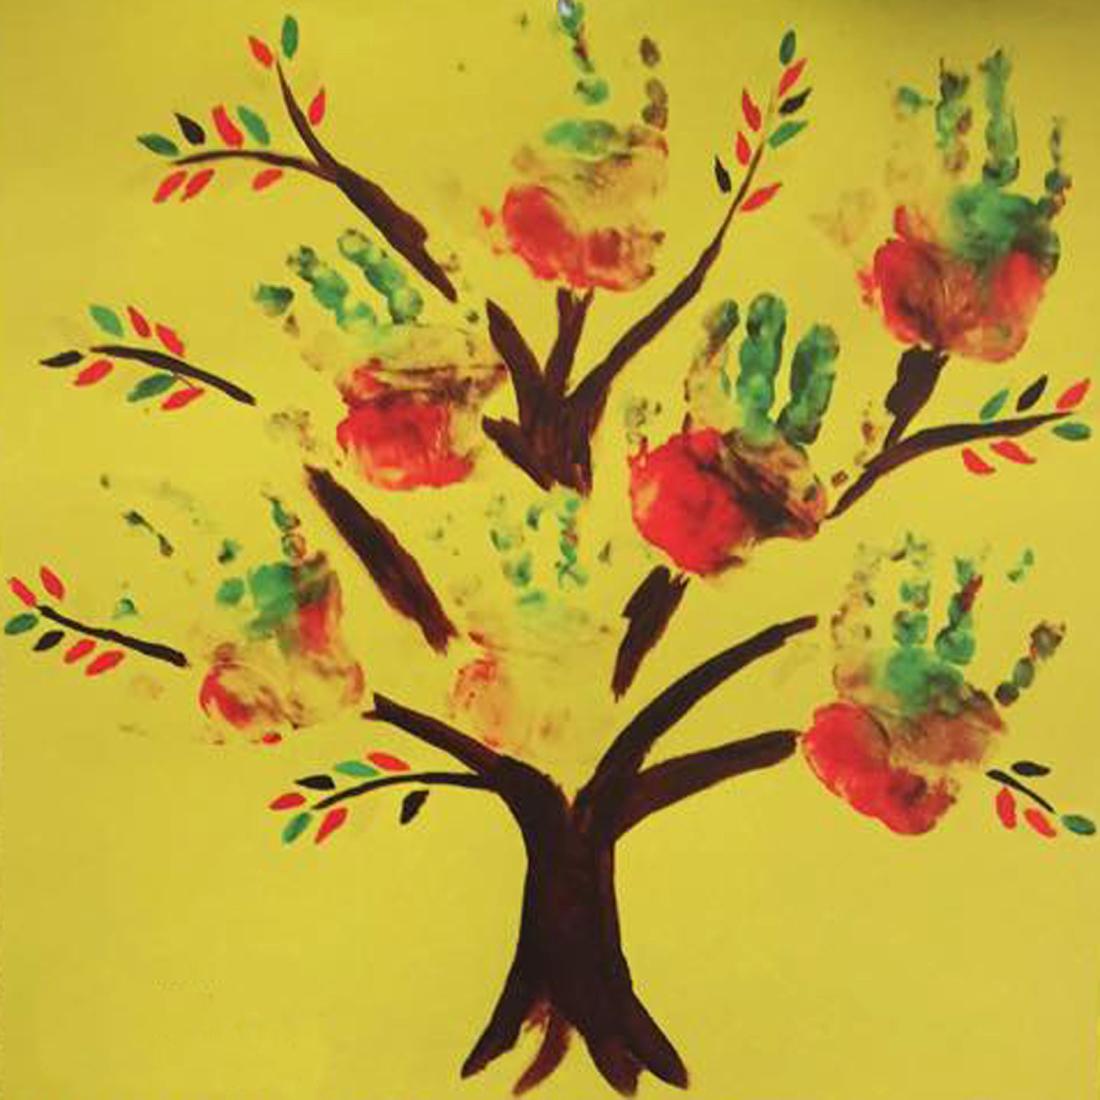 autumn tree hands